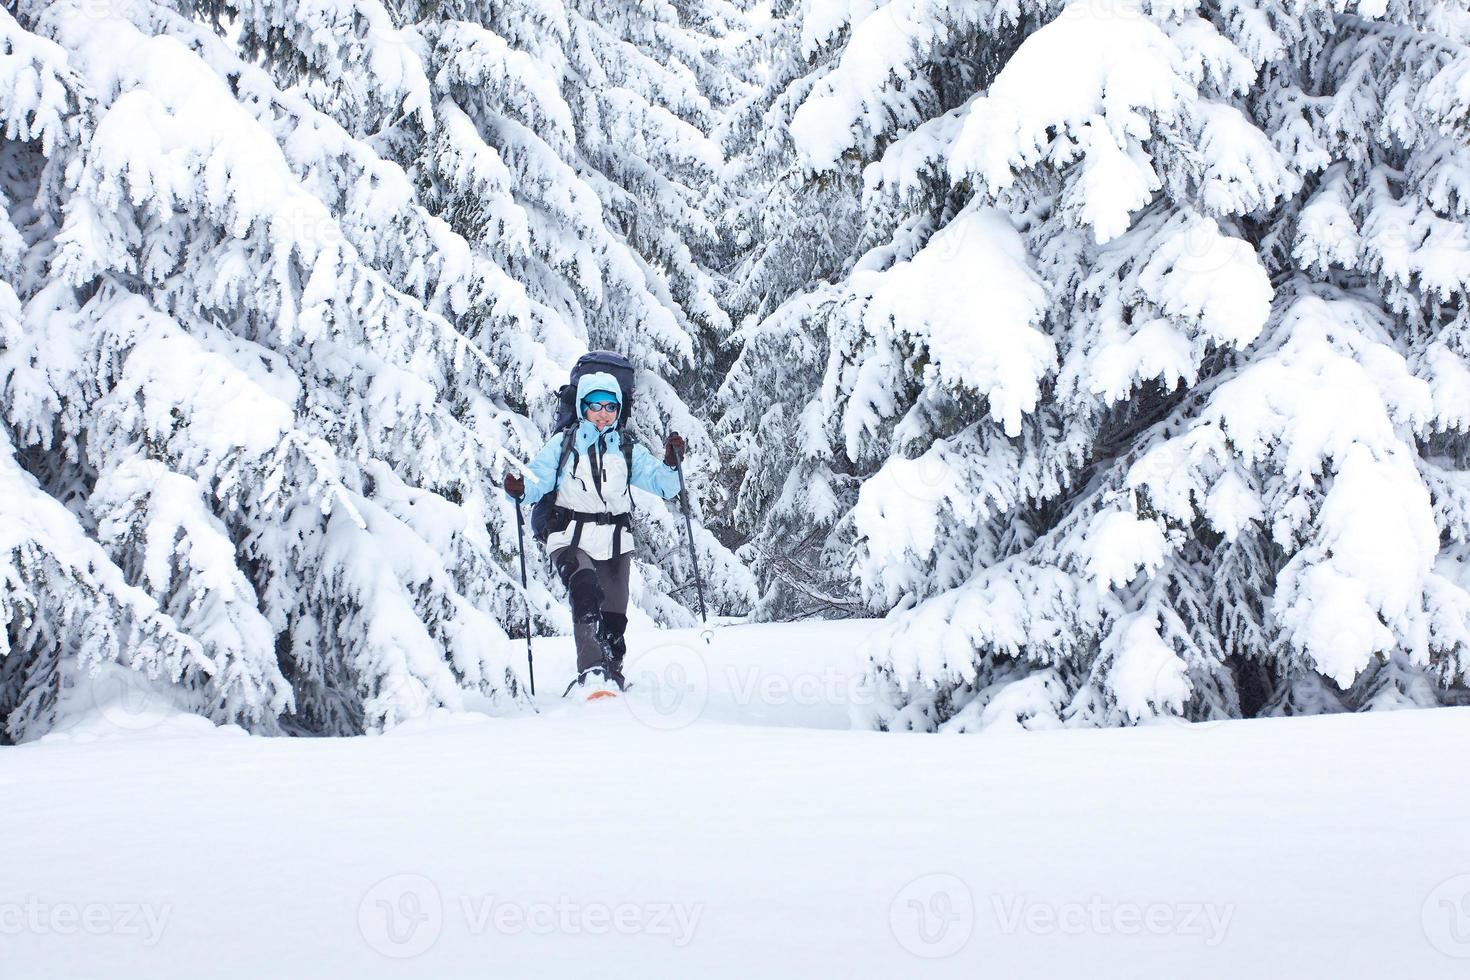 alpinista na floresta de inverno foto